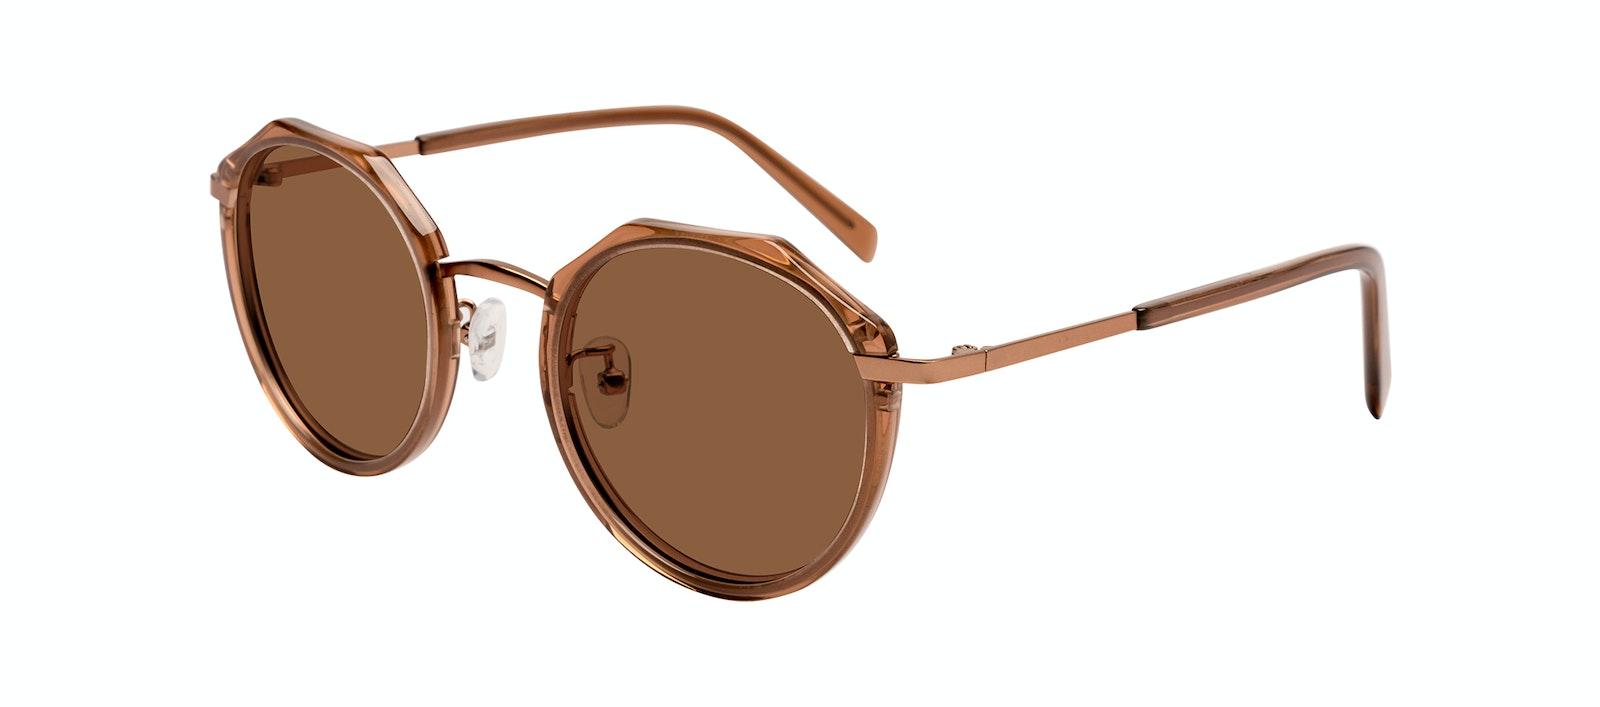 Affordable Fashion Glasses Round Sunglasses Women Womance Jules Tilt